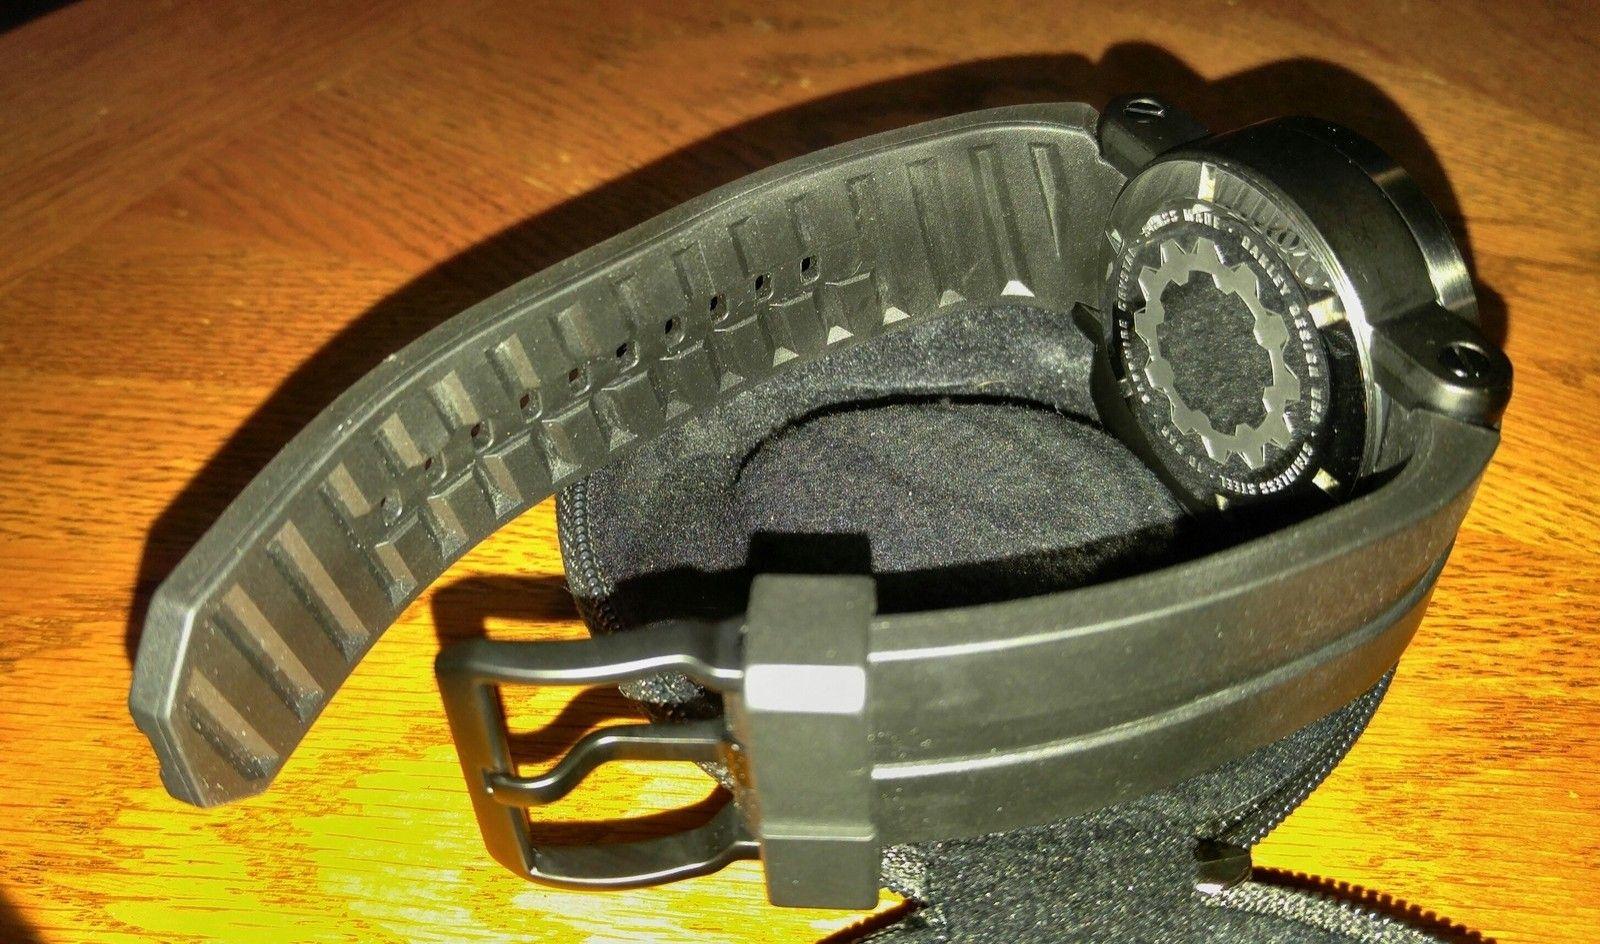 Stealth gearbox - 20151230_190406-1.jpg